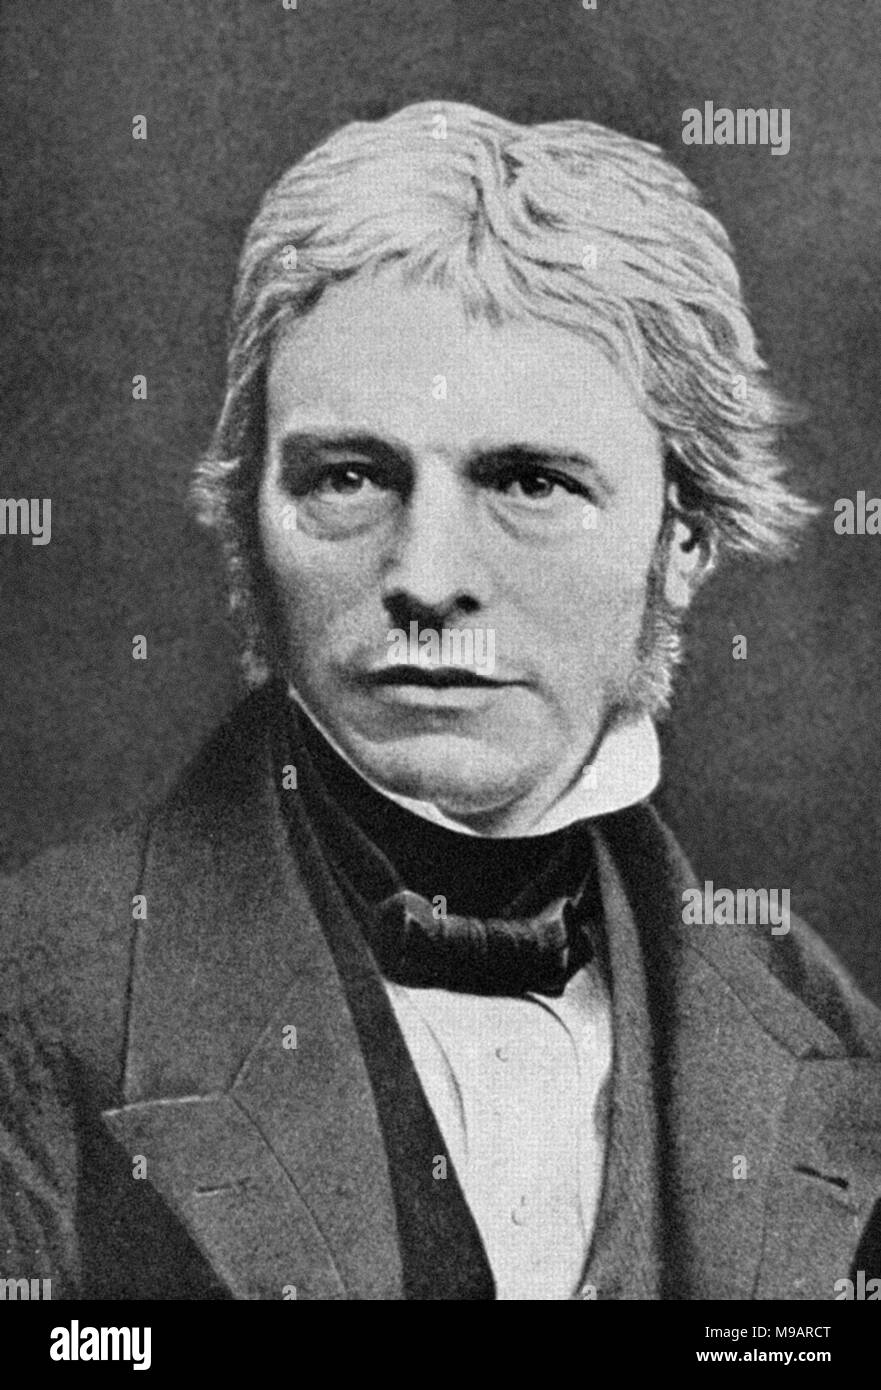 Michael Faraday (1791-1867) - Stock Image